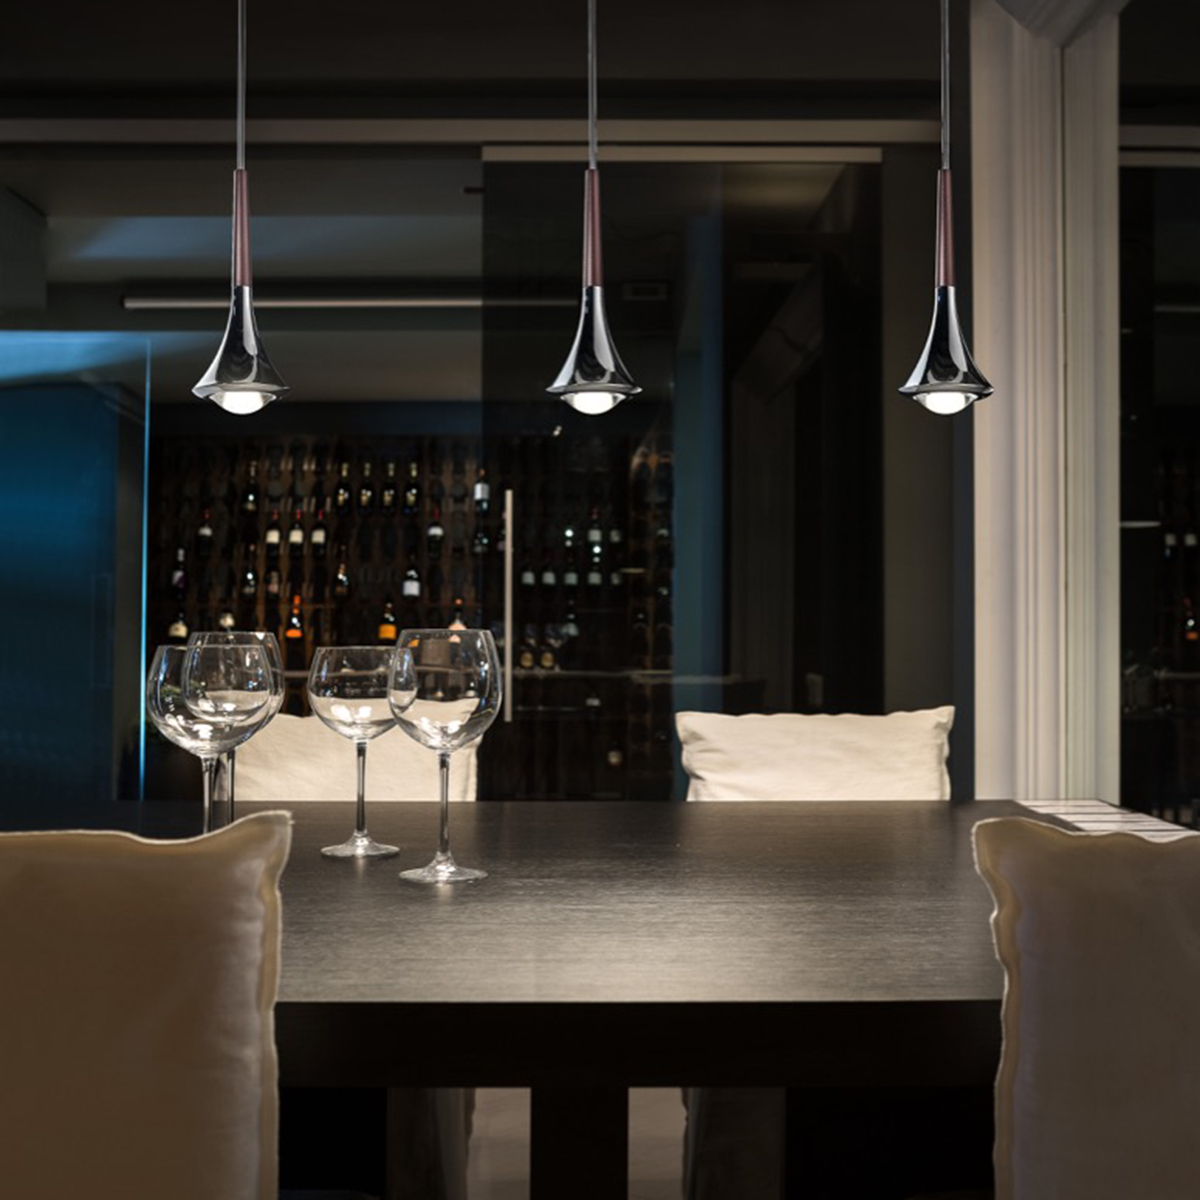 studio italia design rain. Black Bedroom Furniture Sets. Home Design Ideas